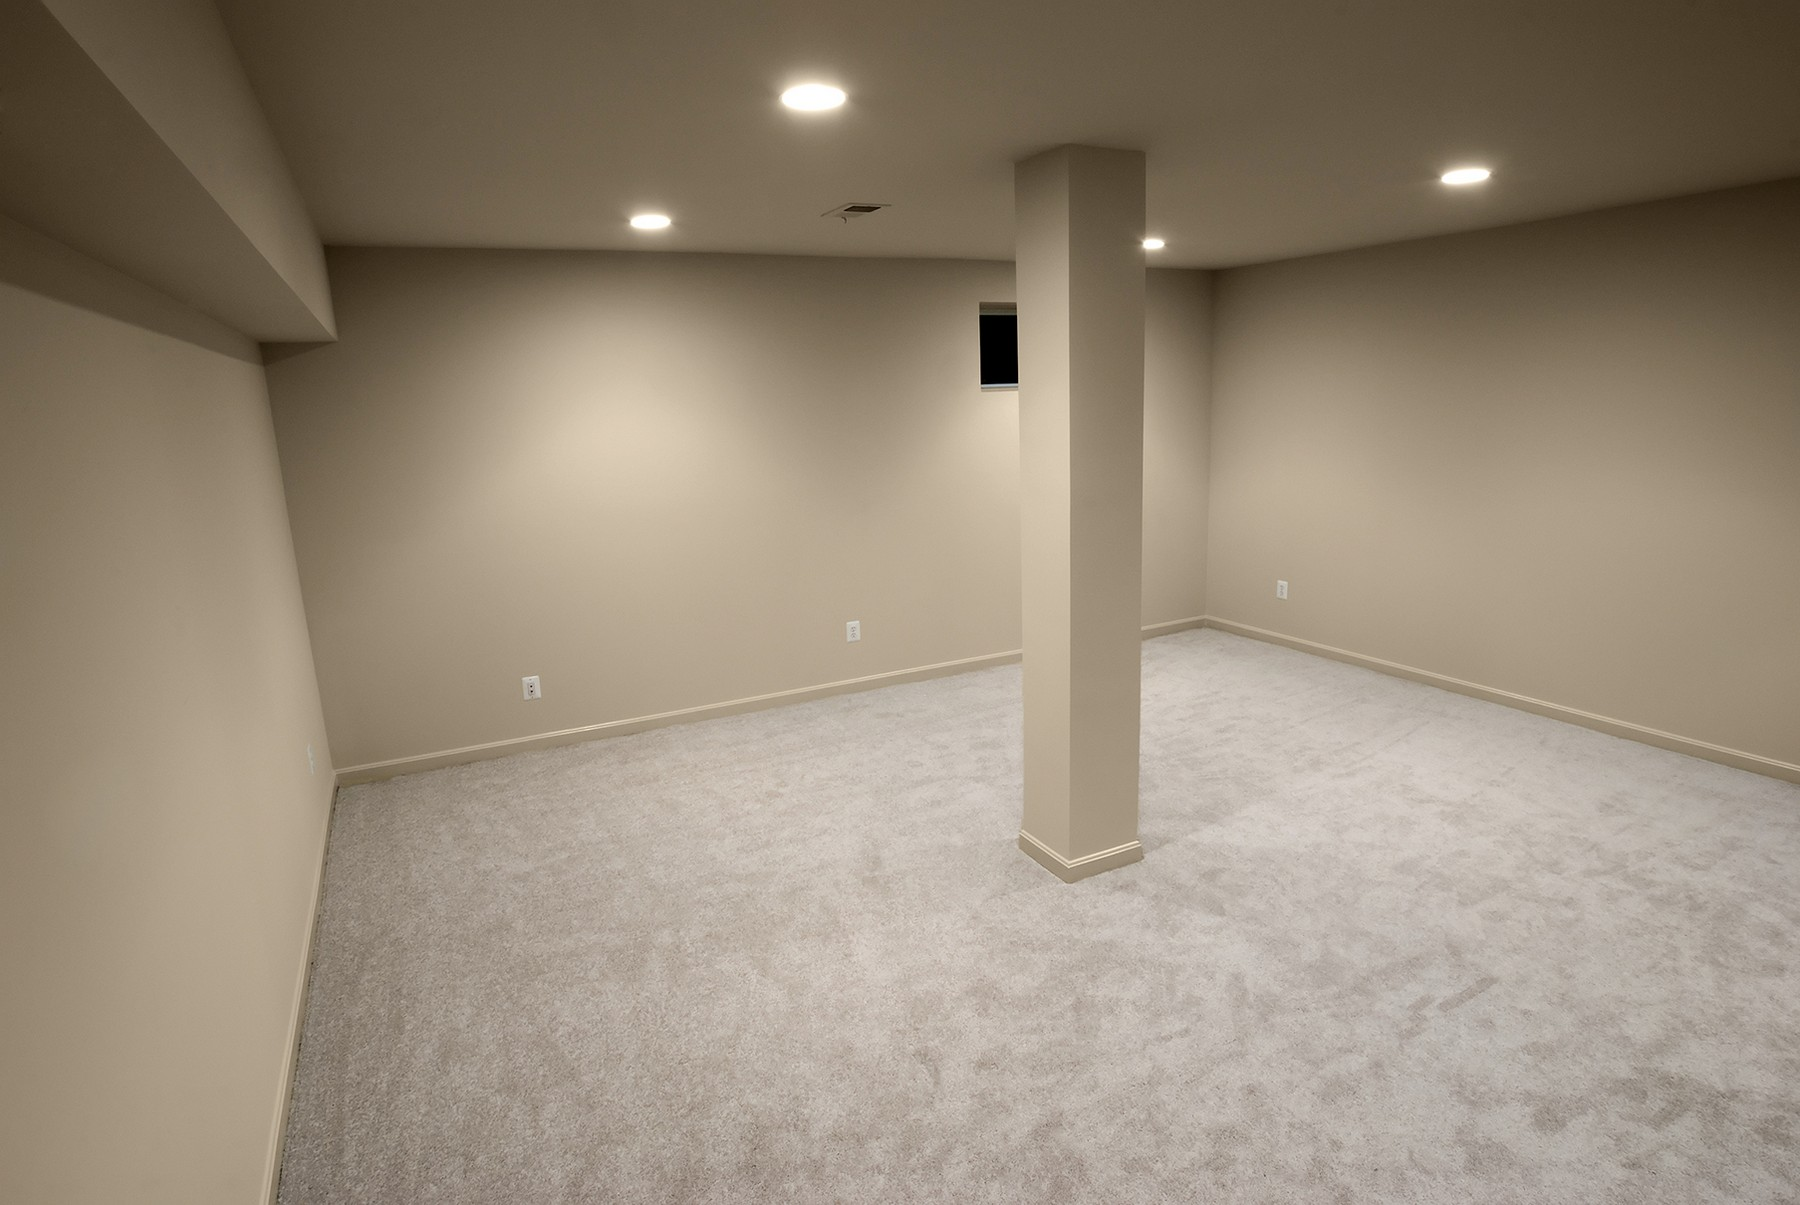 toledo photo gallery basement waterproofing before afters